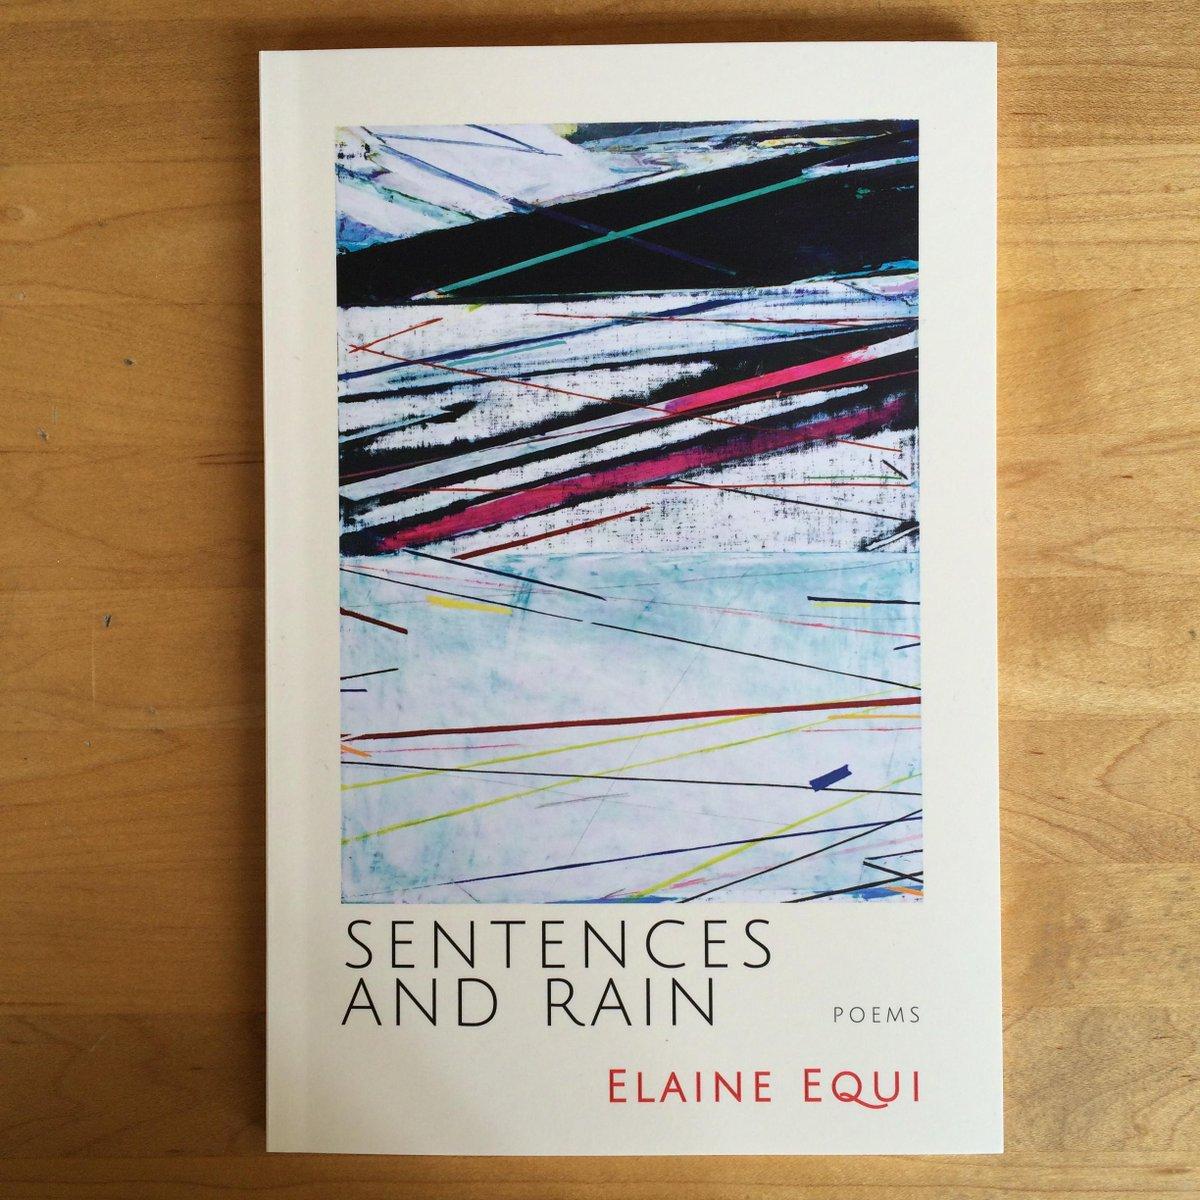 Resultado de imagen para sentences and rain equi